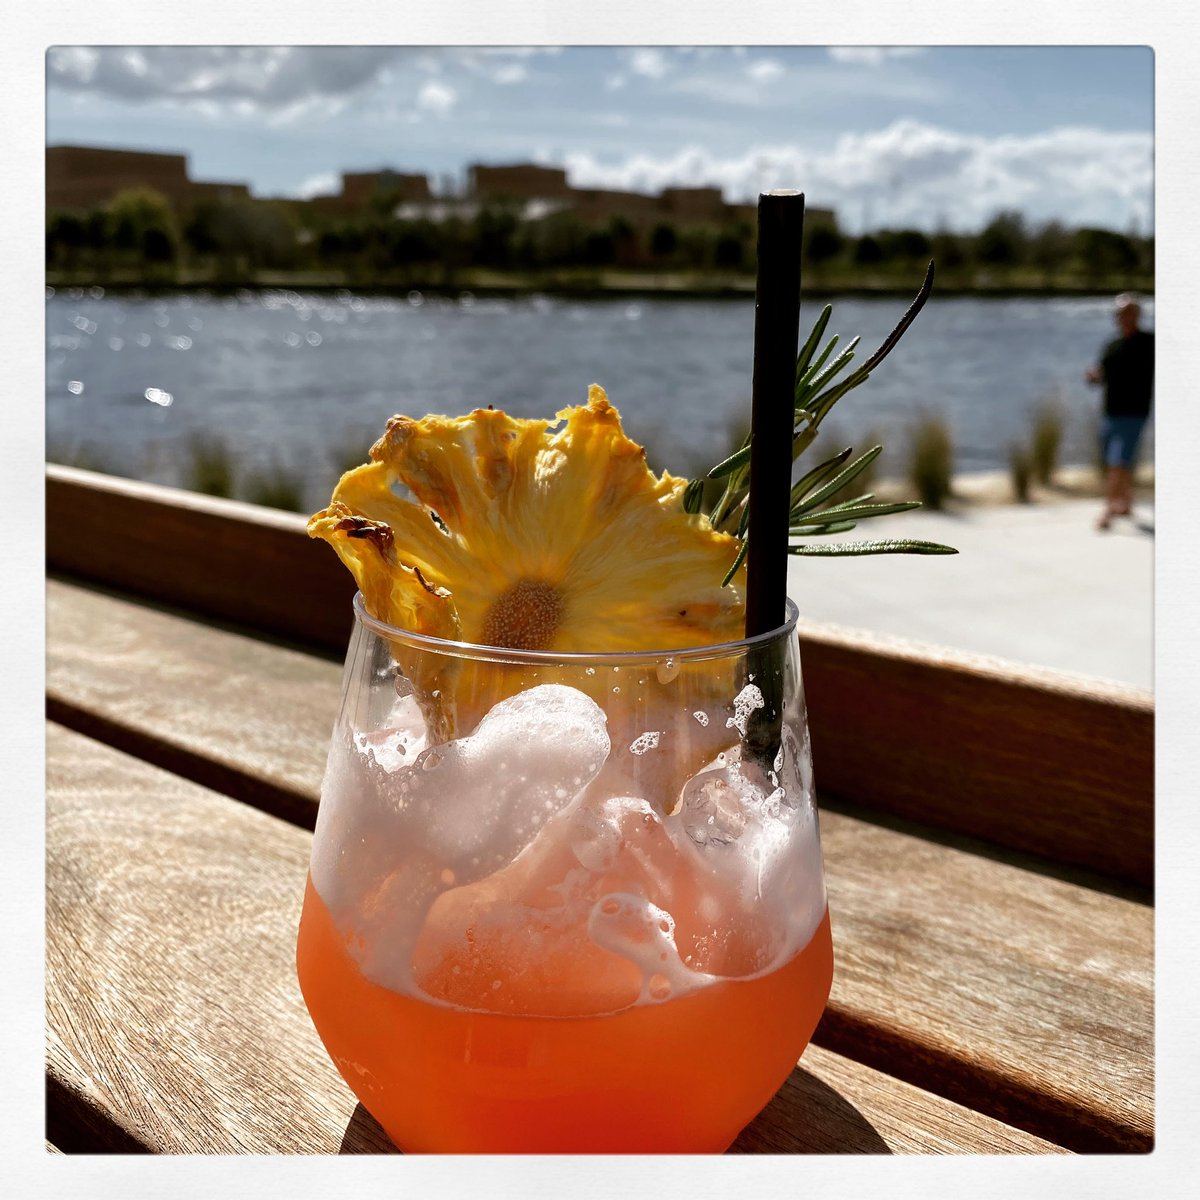 #sundayfunday #stonethrow #armatureworks #adultbeveraging #saythristymyfriends #TampaBay #riverwalk